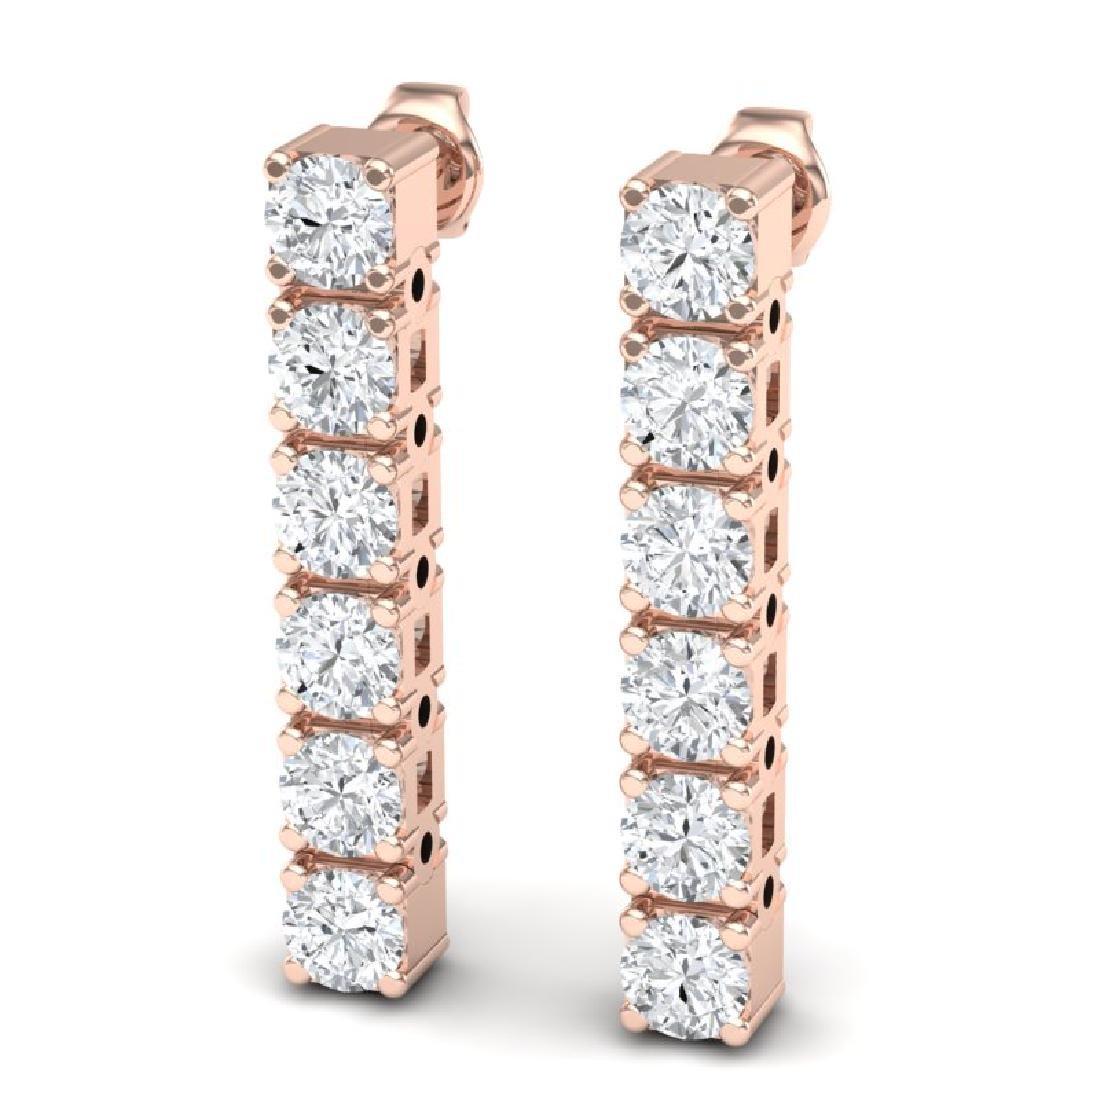 3 CTW Certified VS/SI Diamond Earrings 18K Rose Gold - 2